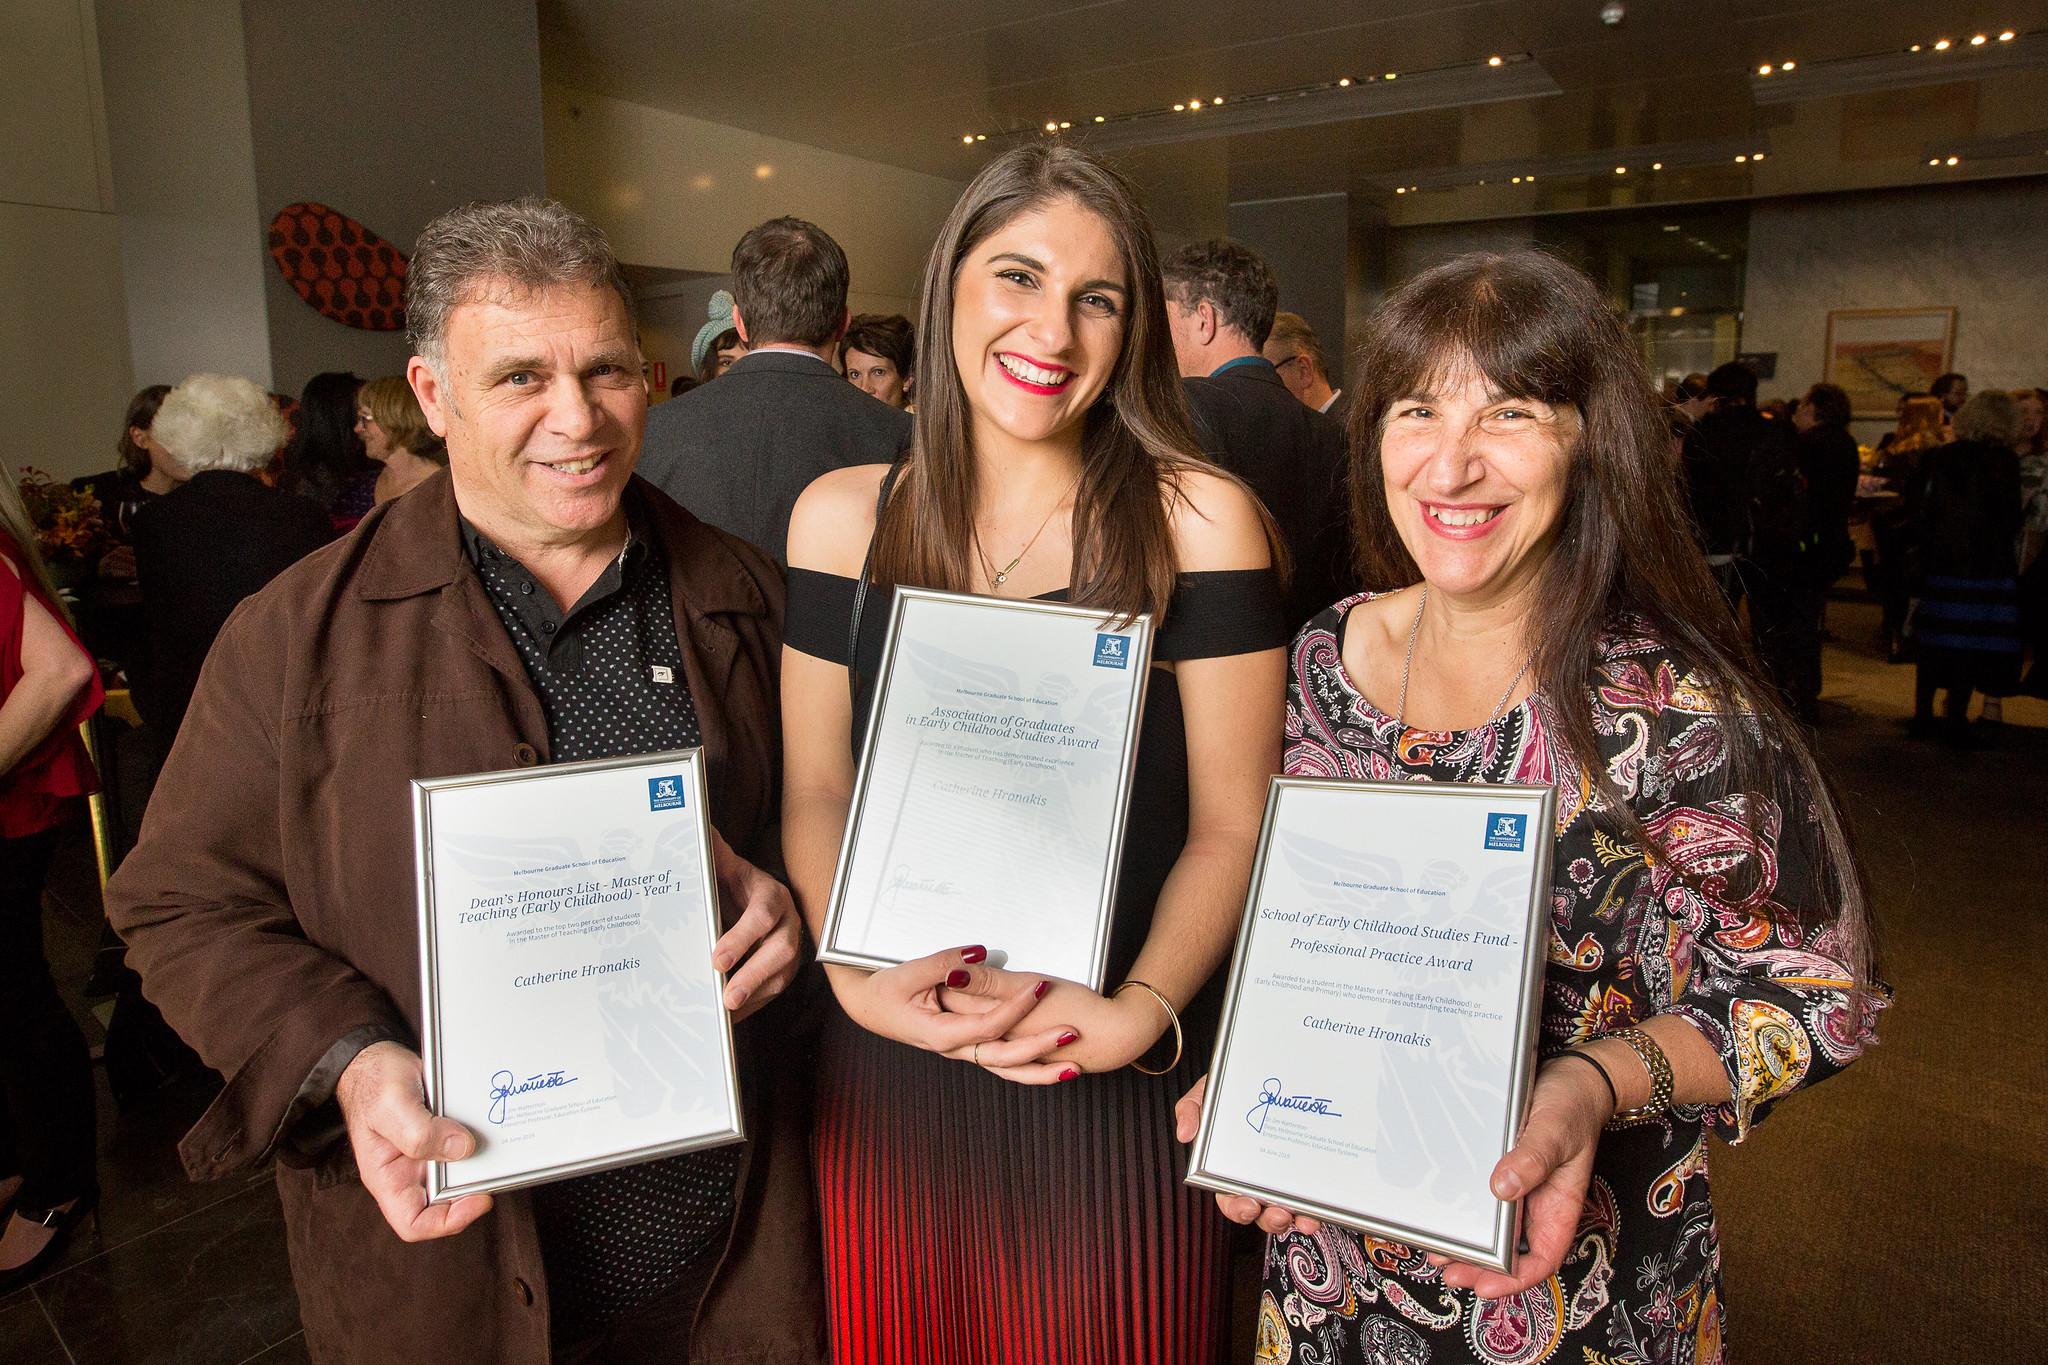 Catherine Hronakis with awards